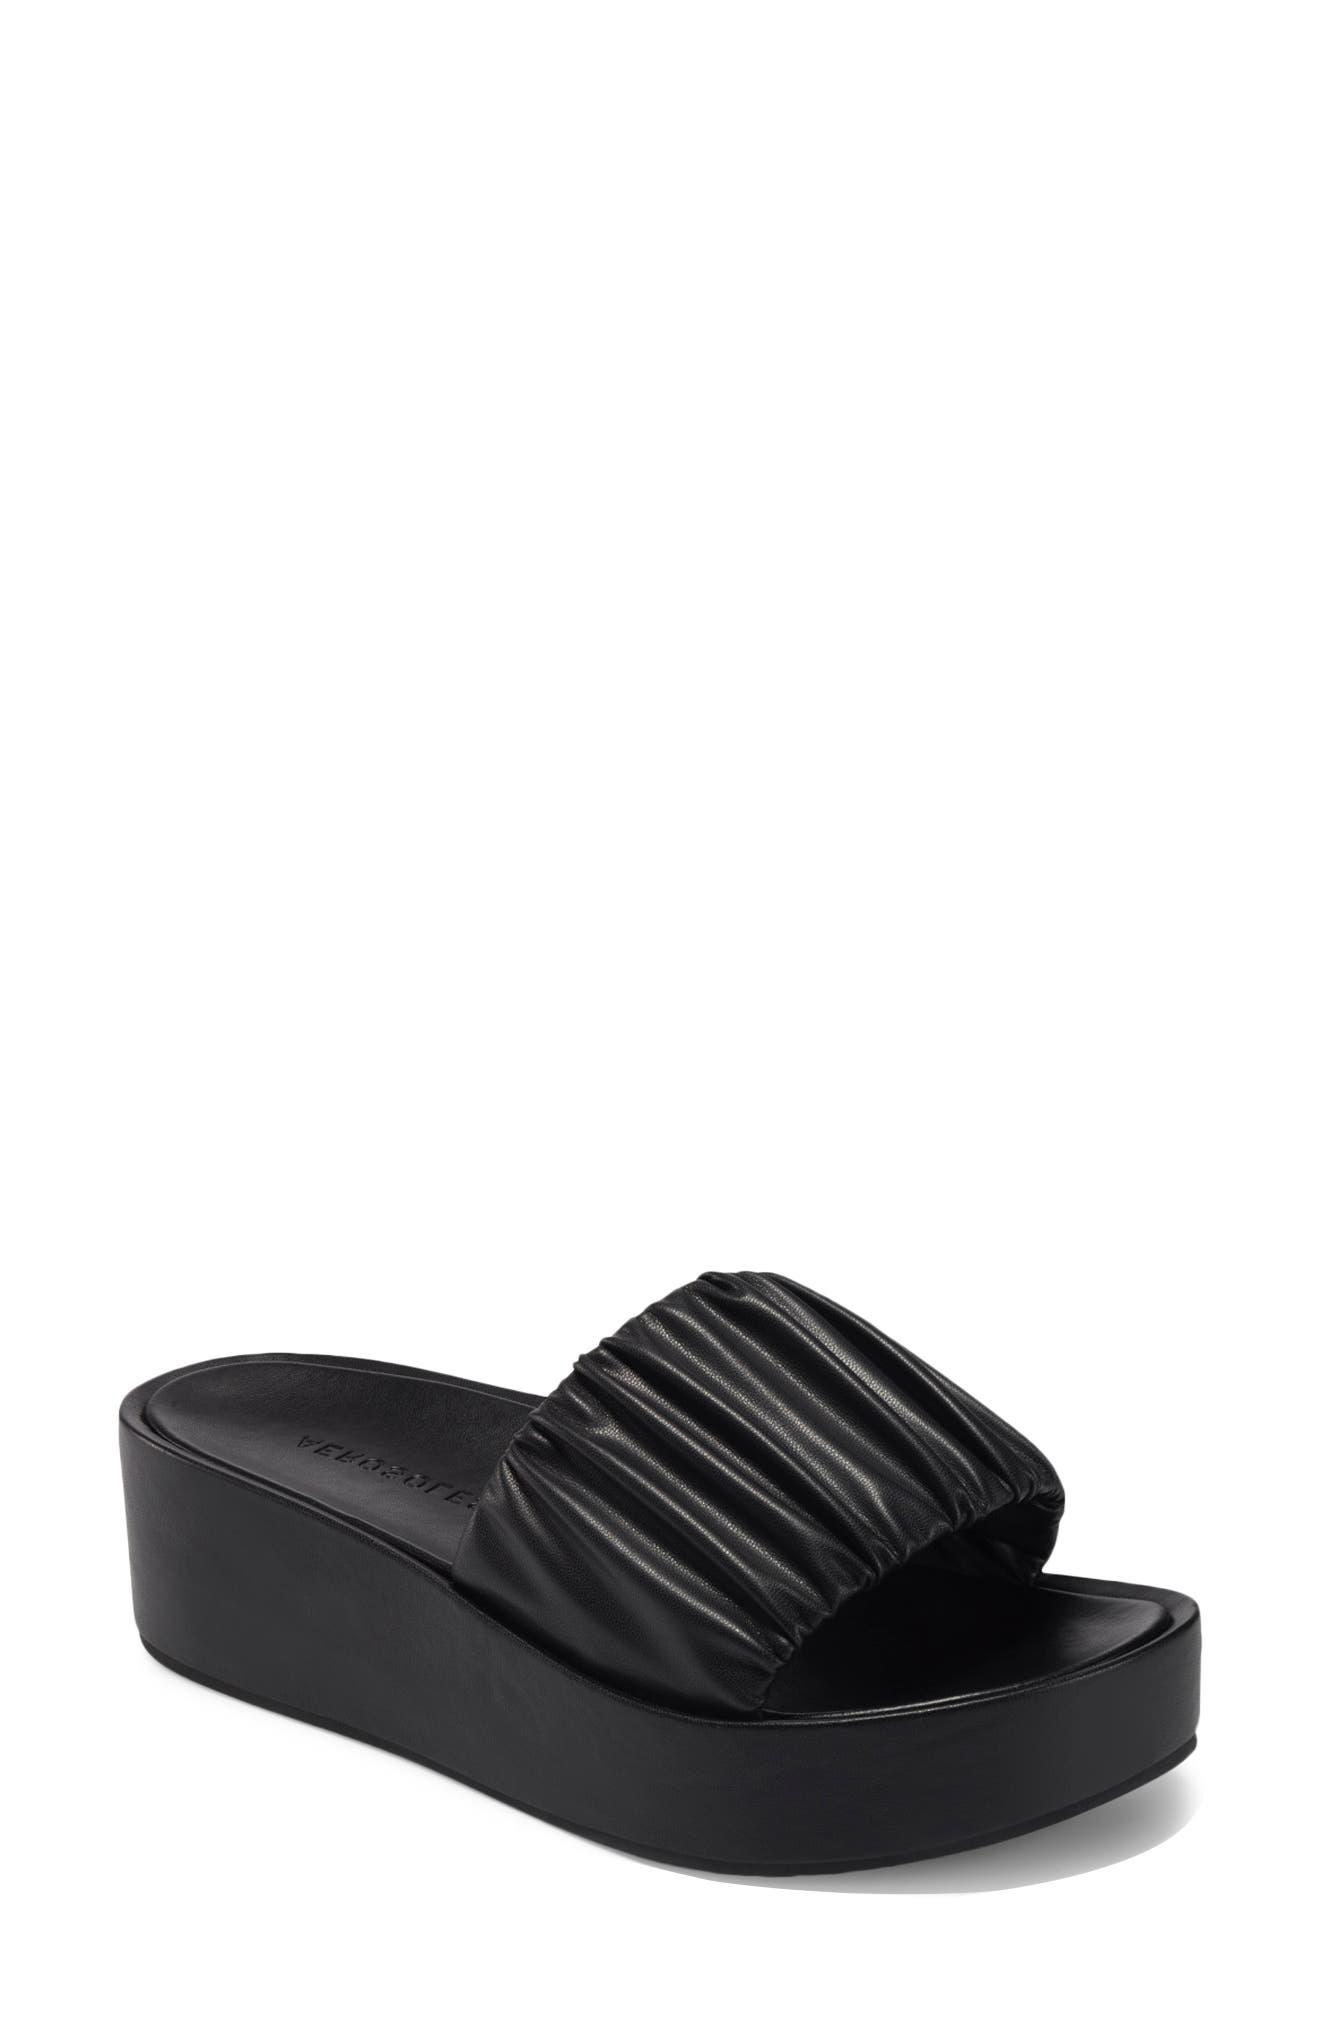 Women's Aerosole Dada Platform Wedge Slide Sandal